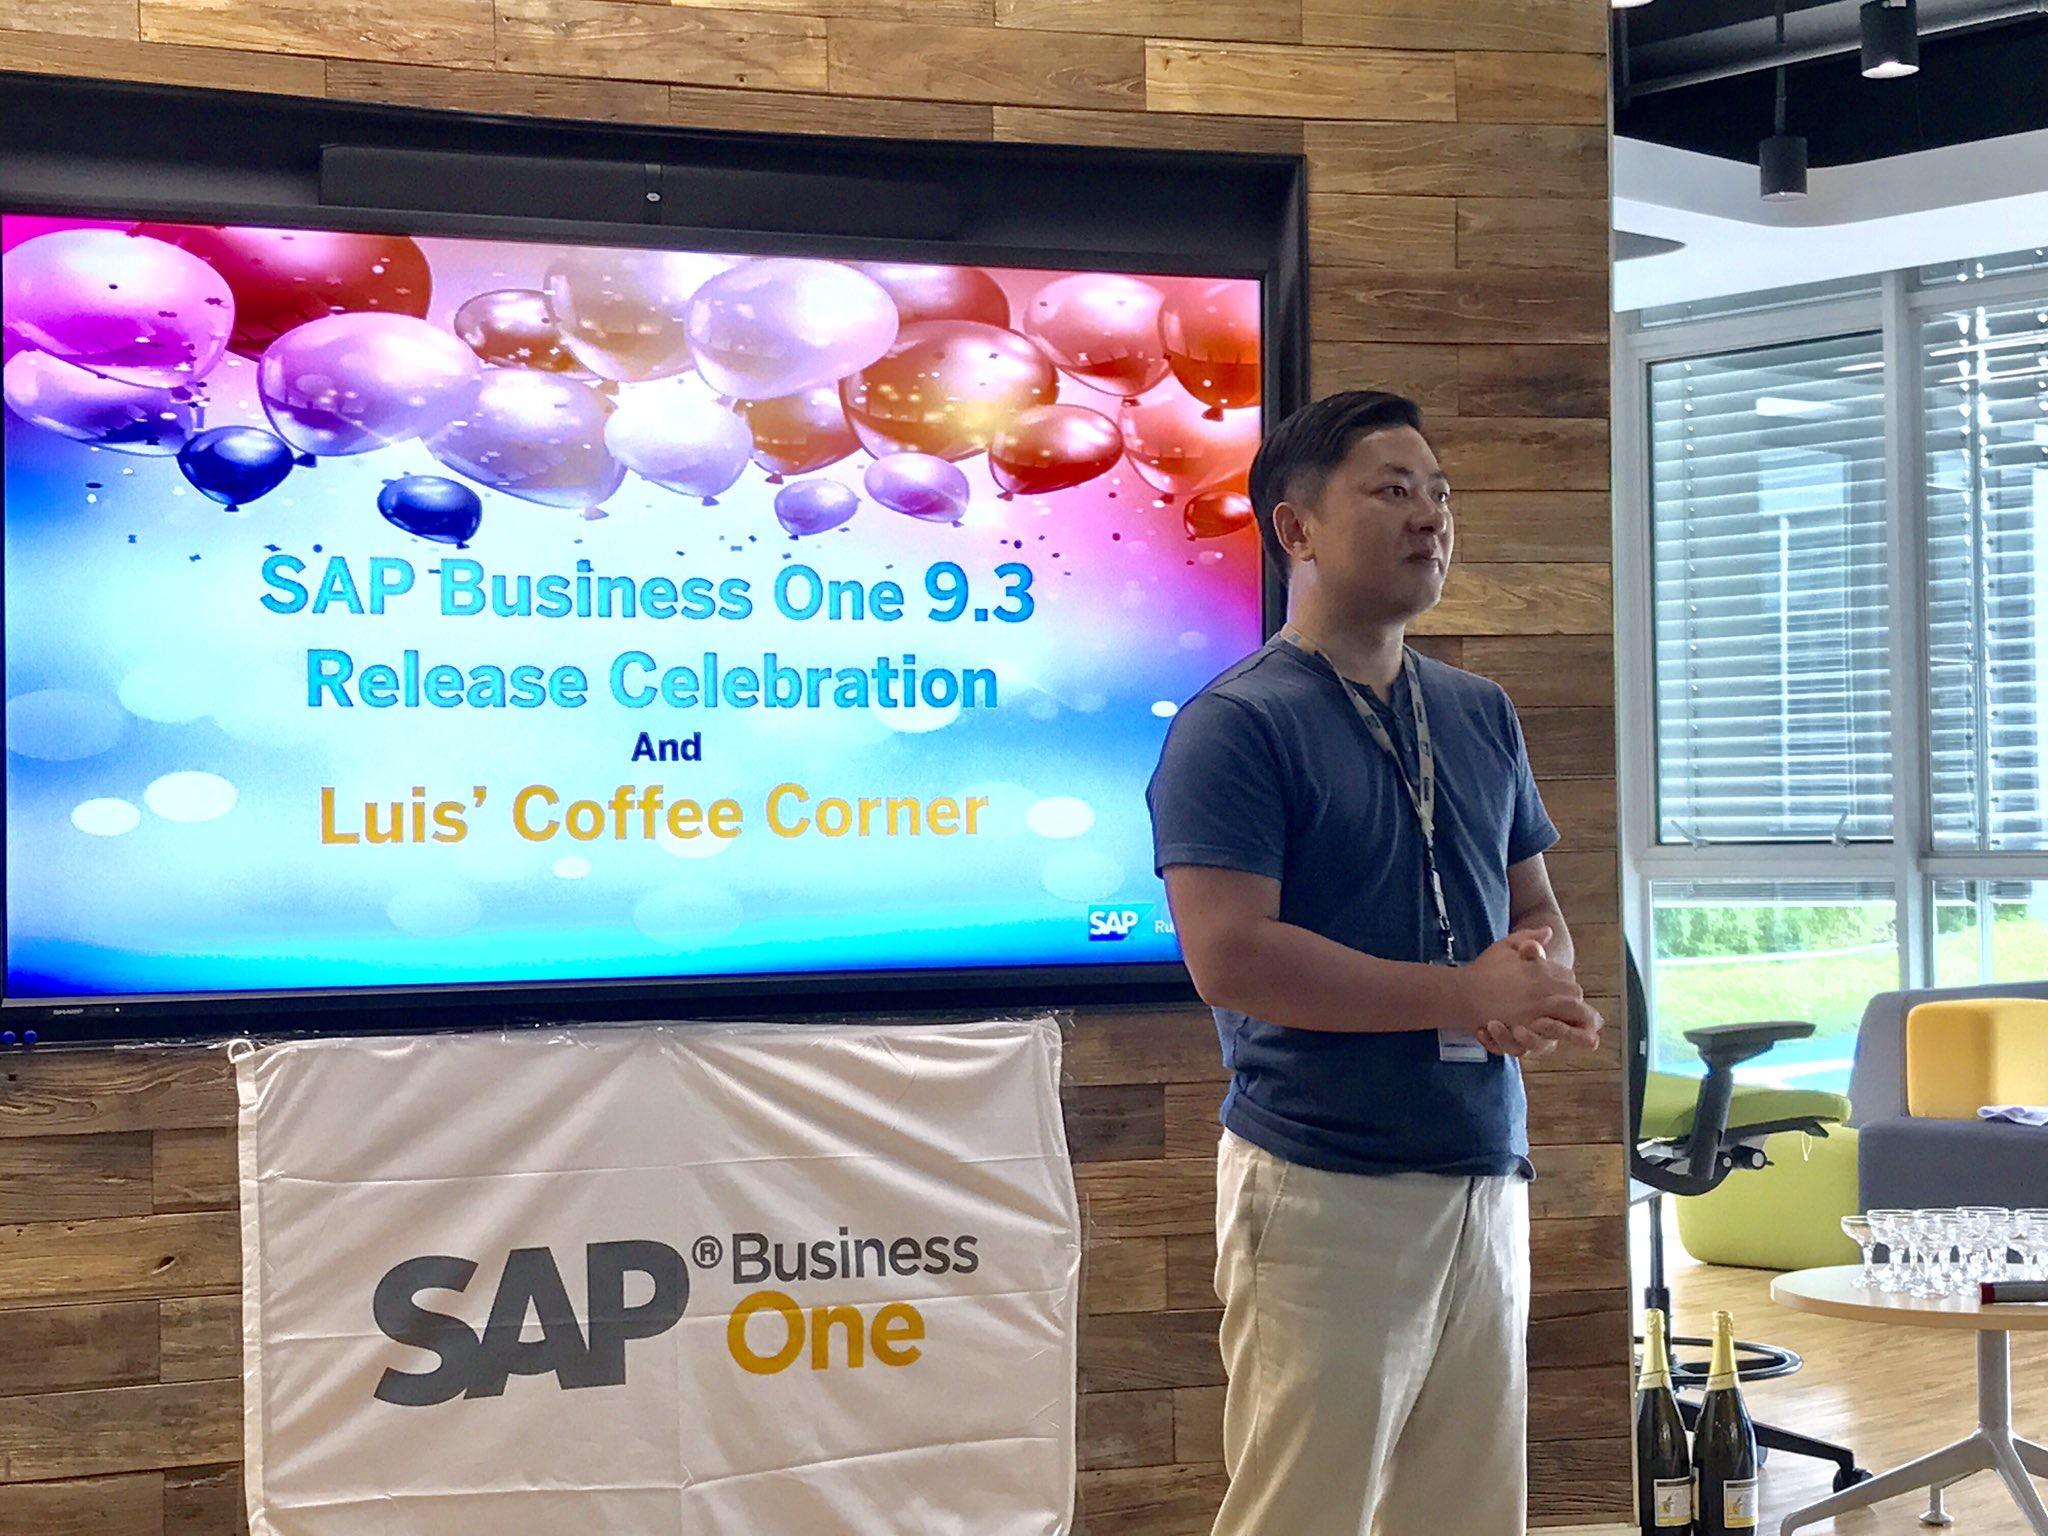 SAP_Business_One93.jpg